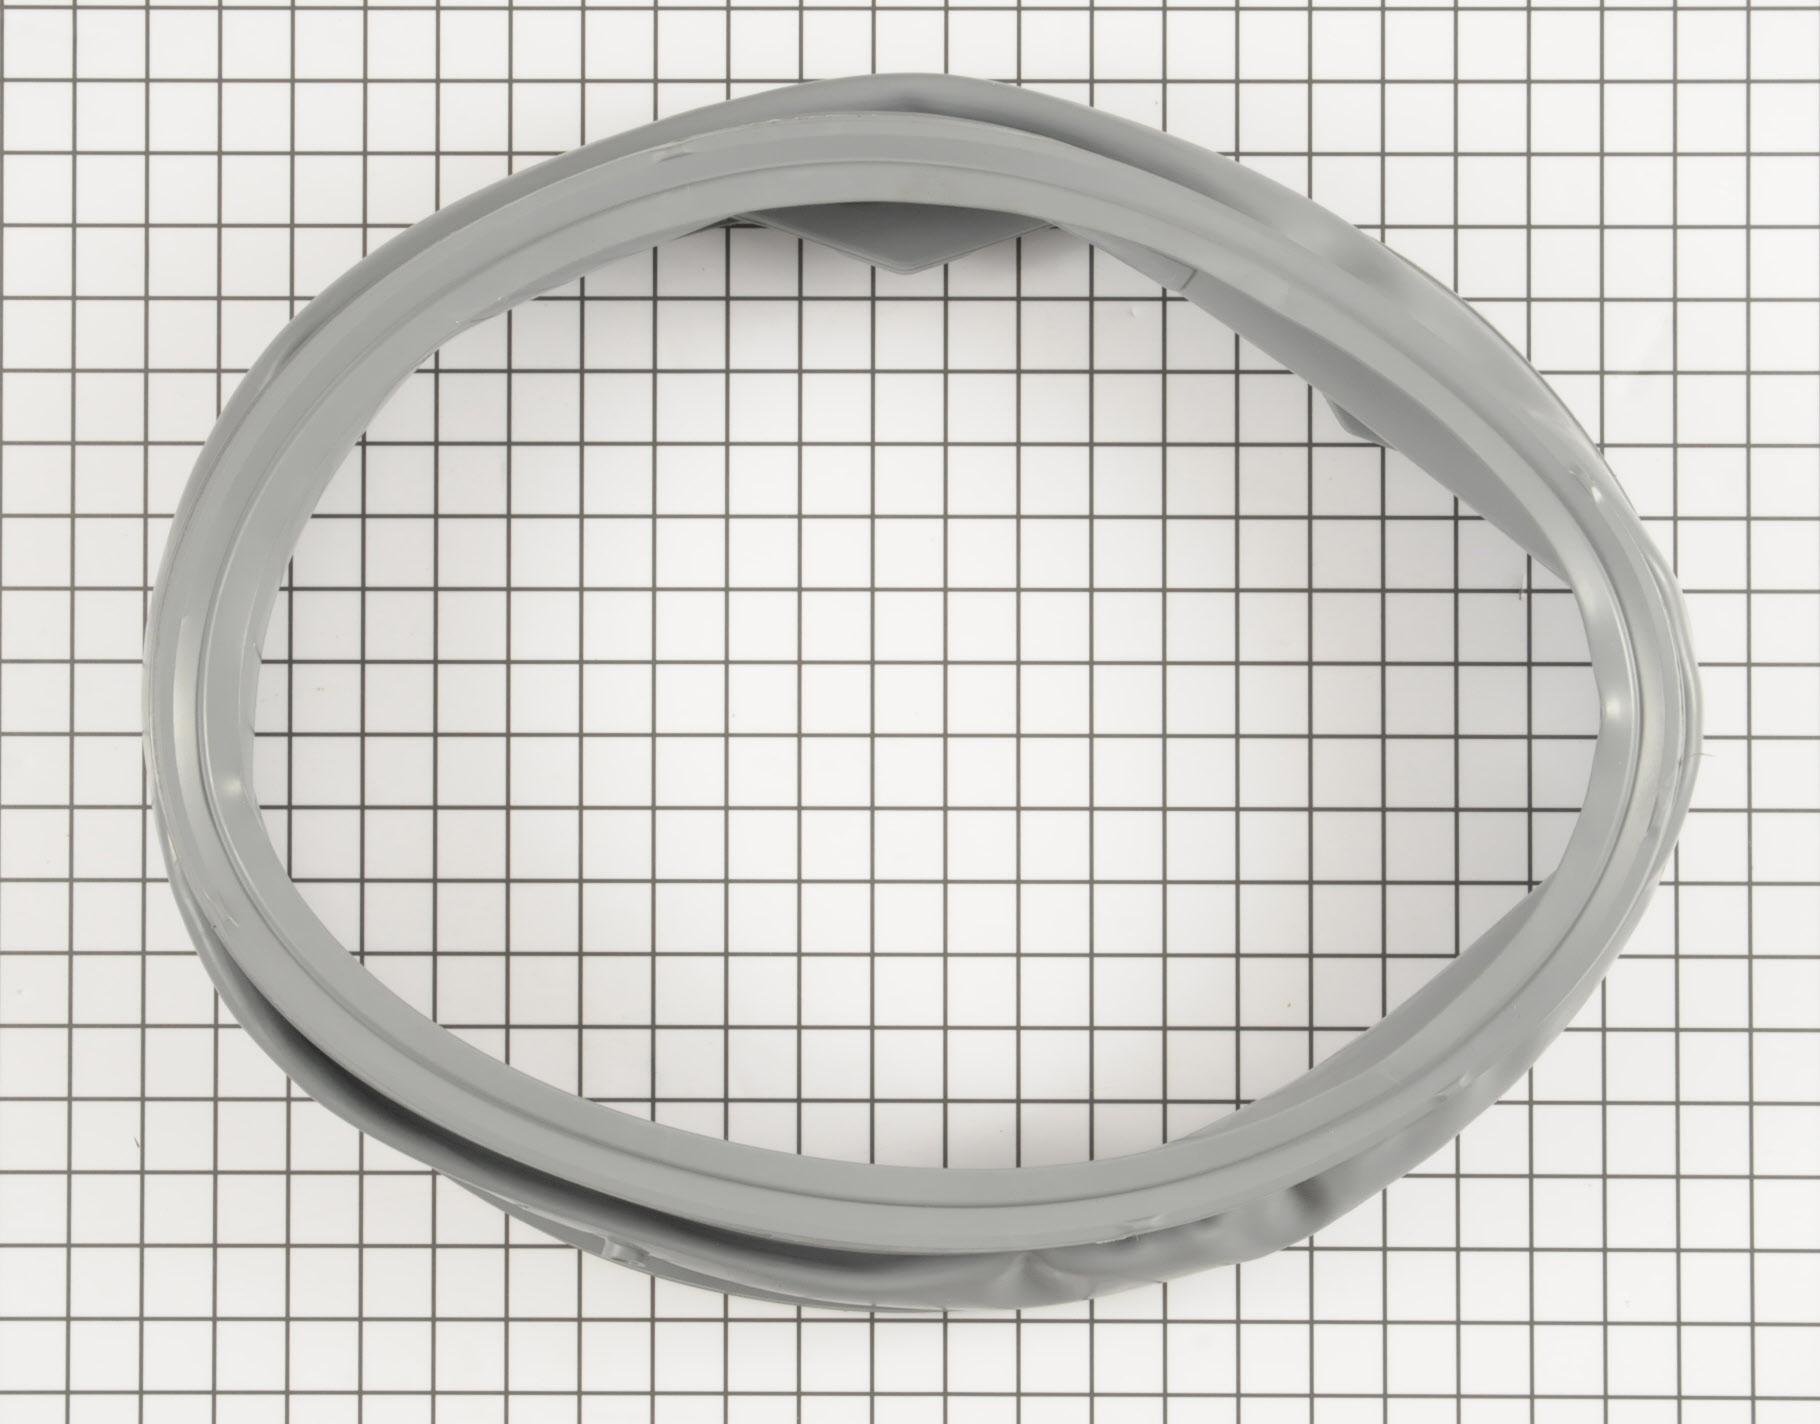 LG Washing Machine Part # MDS33059401 - Door Boot Seal